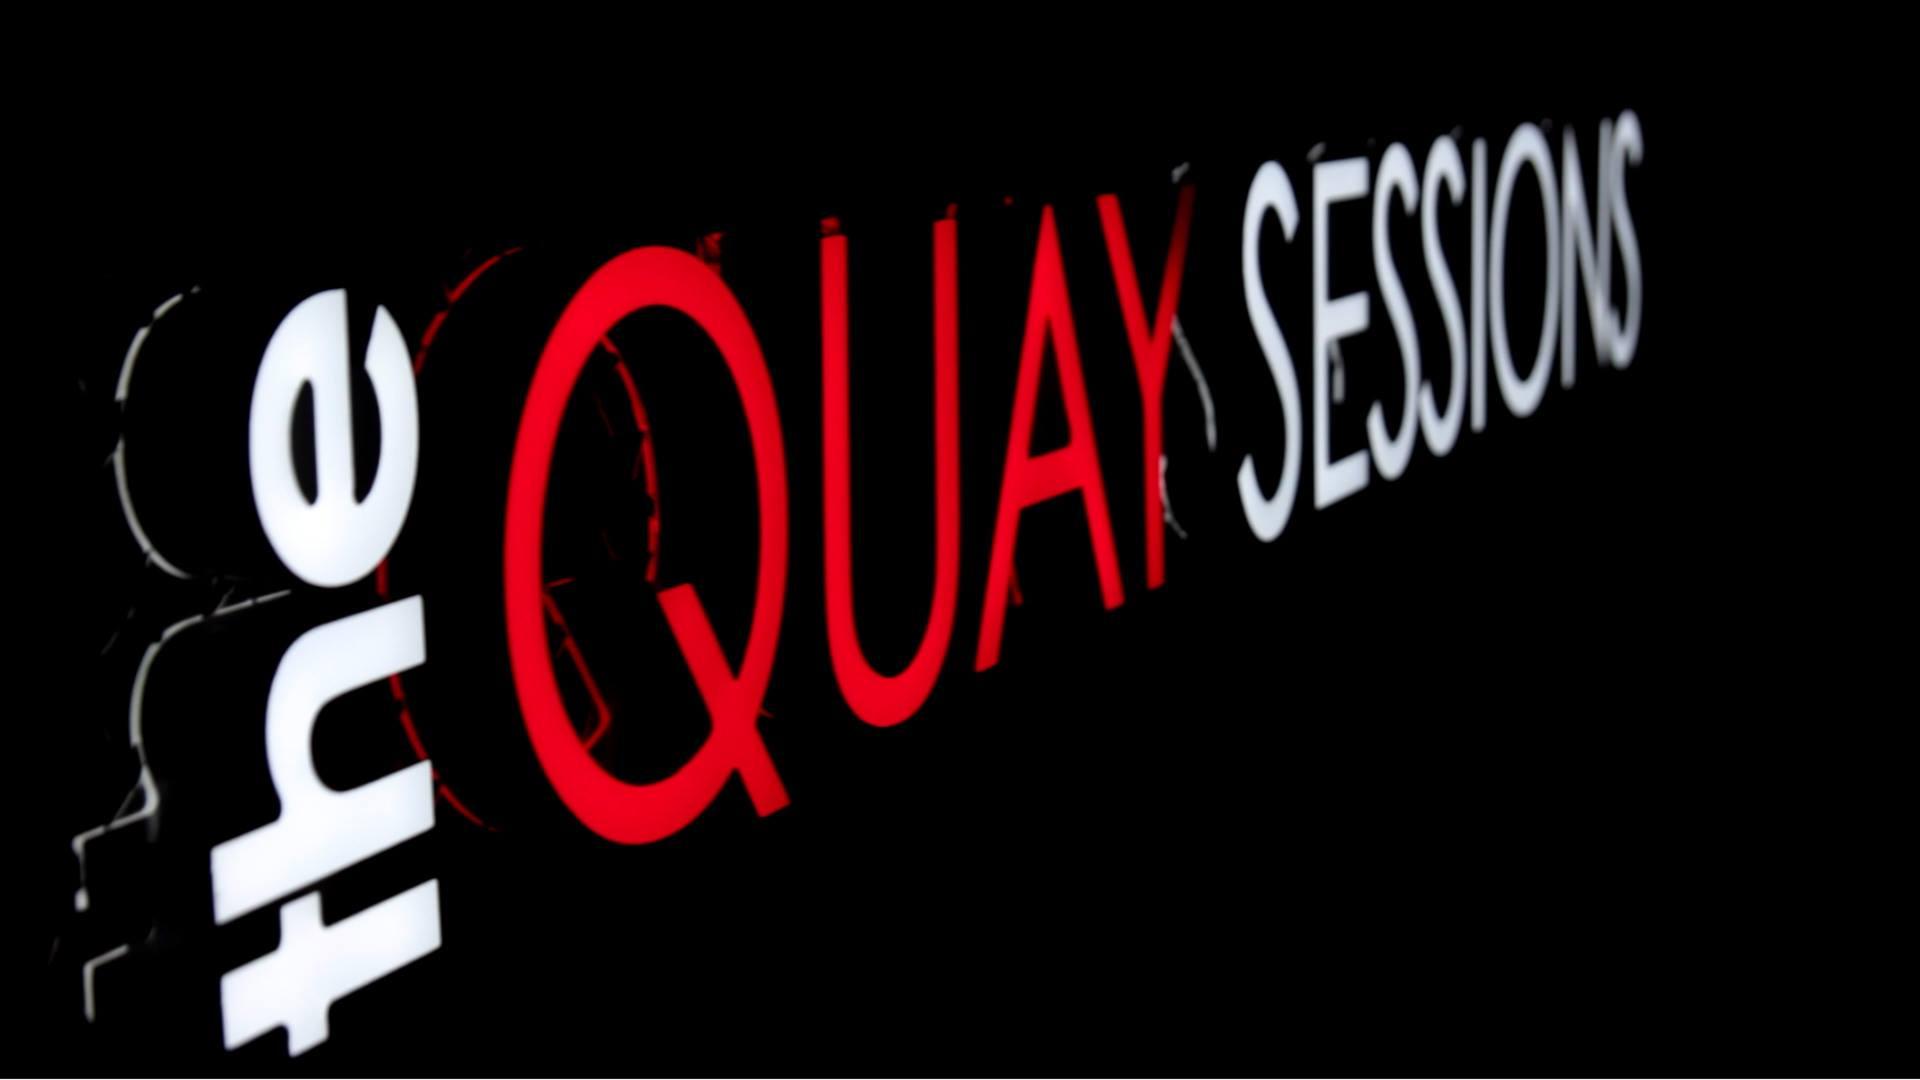 quay-sessions